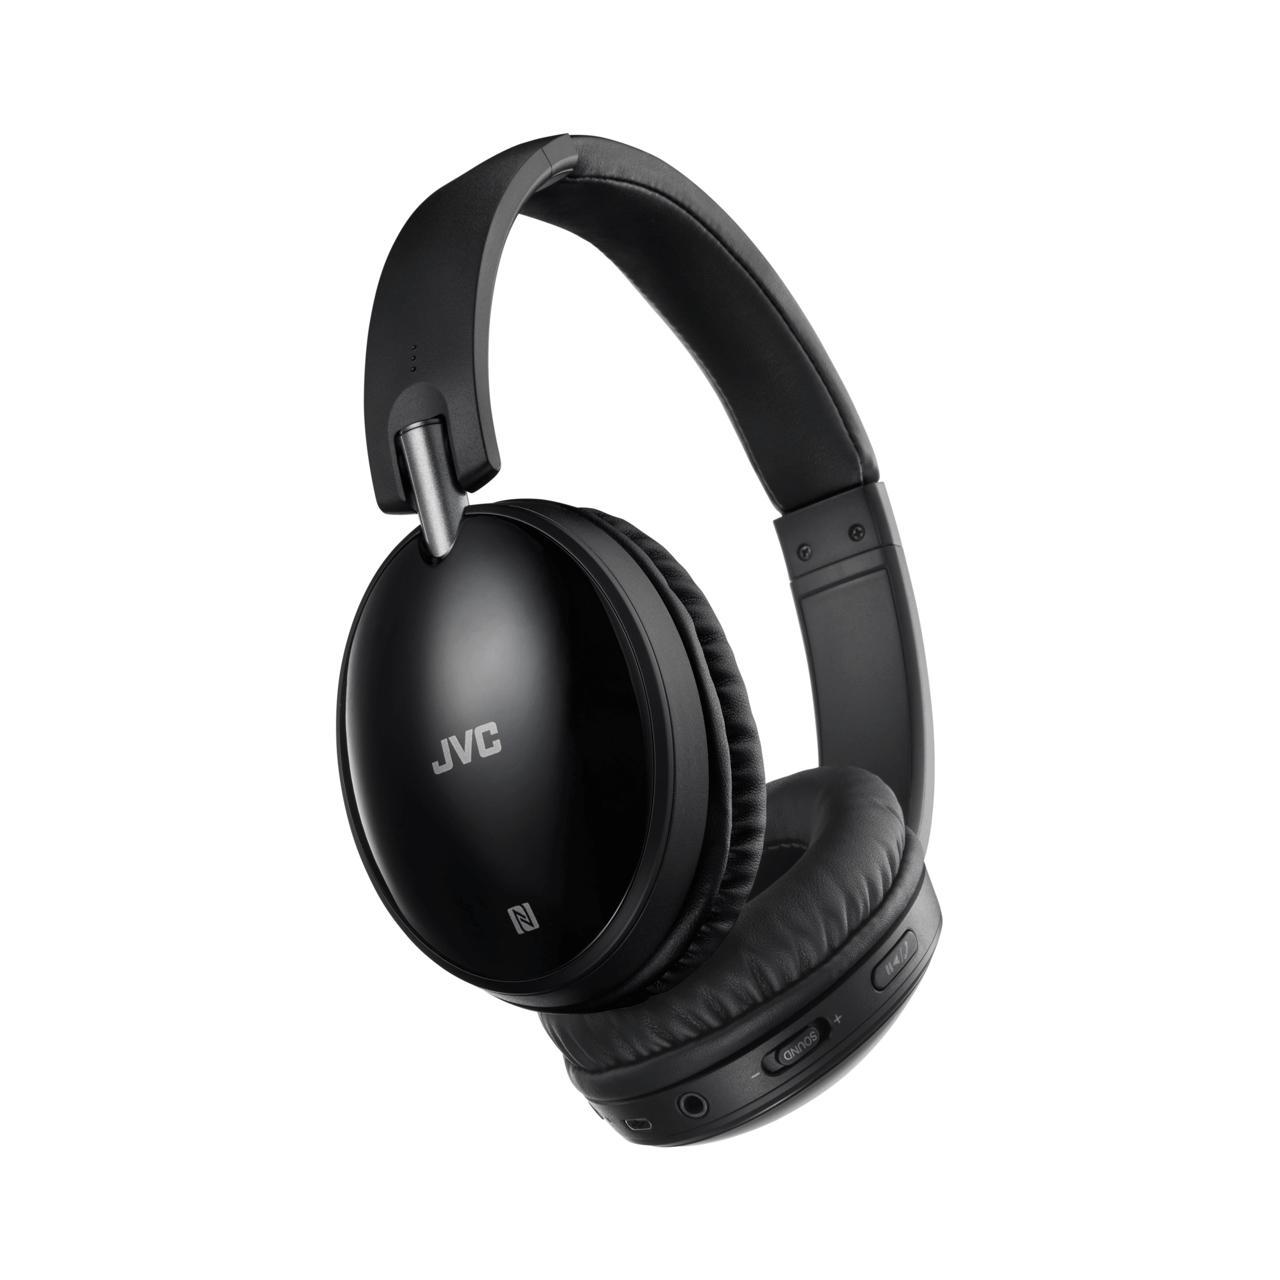 Jvc HA-S70BT-E Bluetooth Hörlurar - Svart